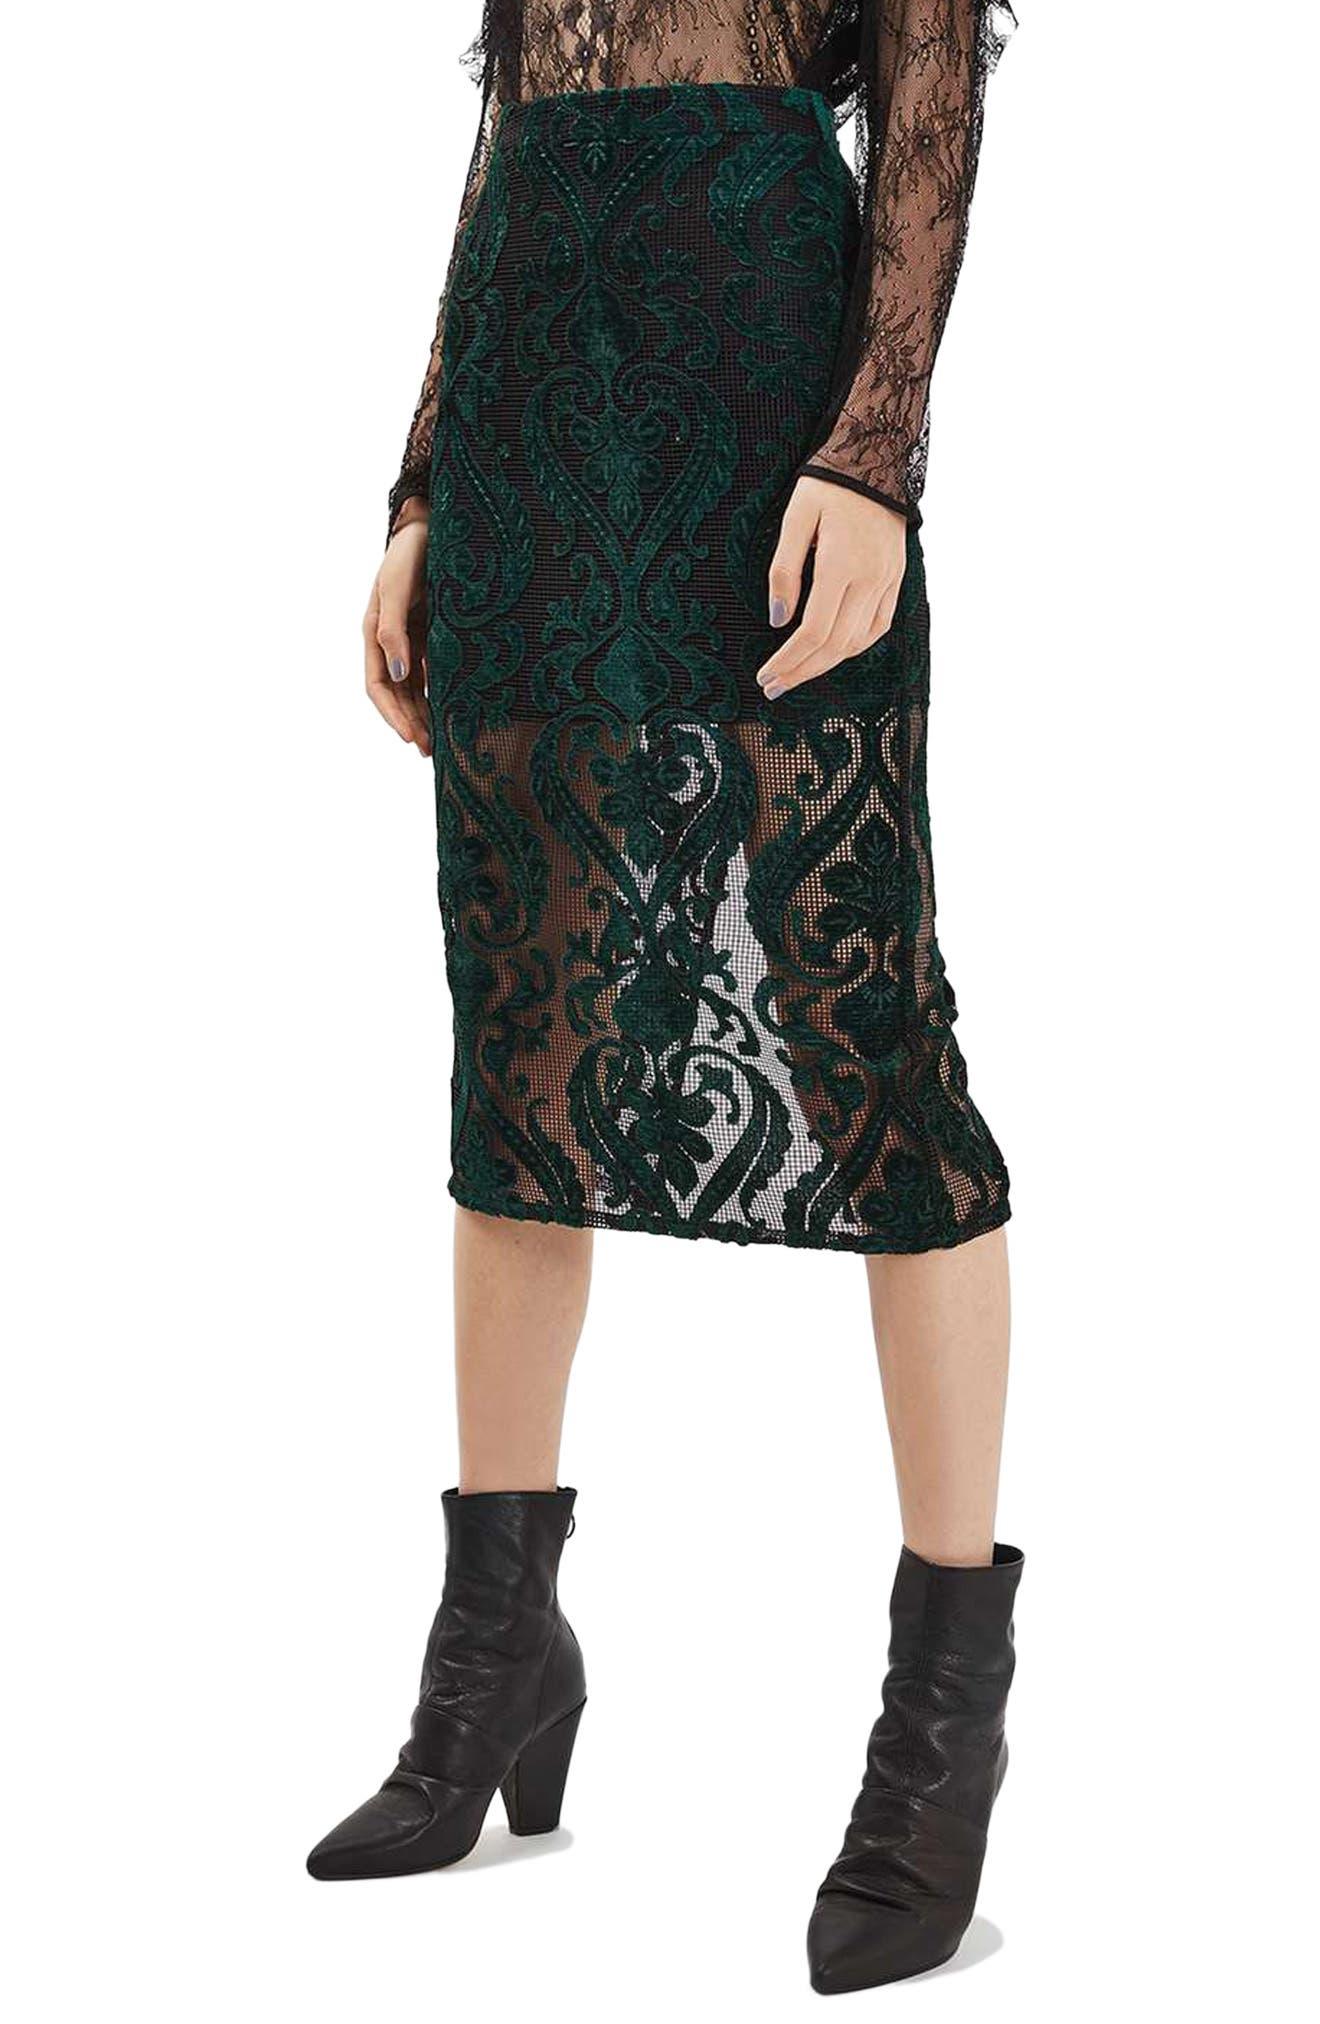 TOPSHOP, Velvet Mesh Pencil Skirt, Main thumbnail 1, color, 301